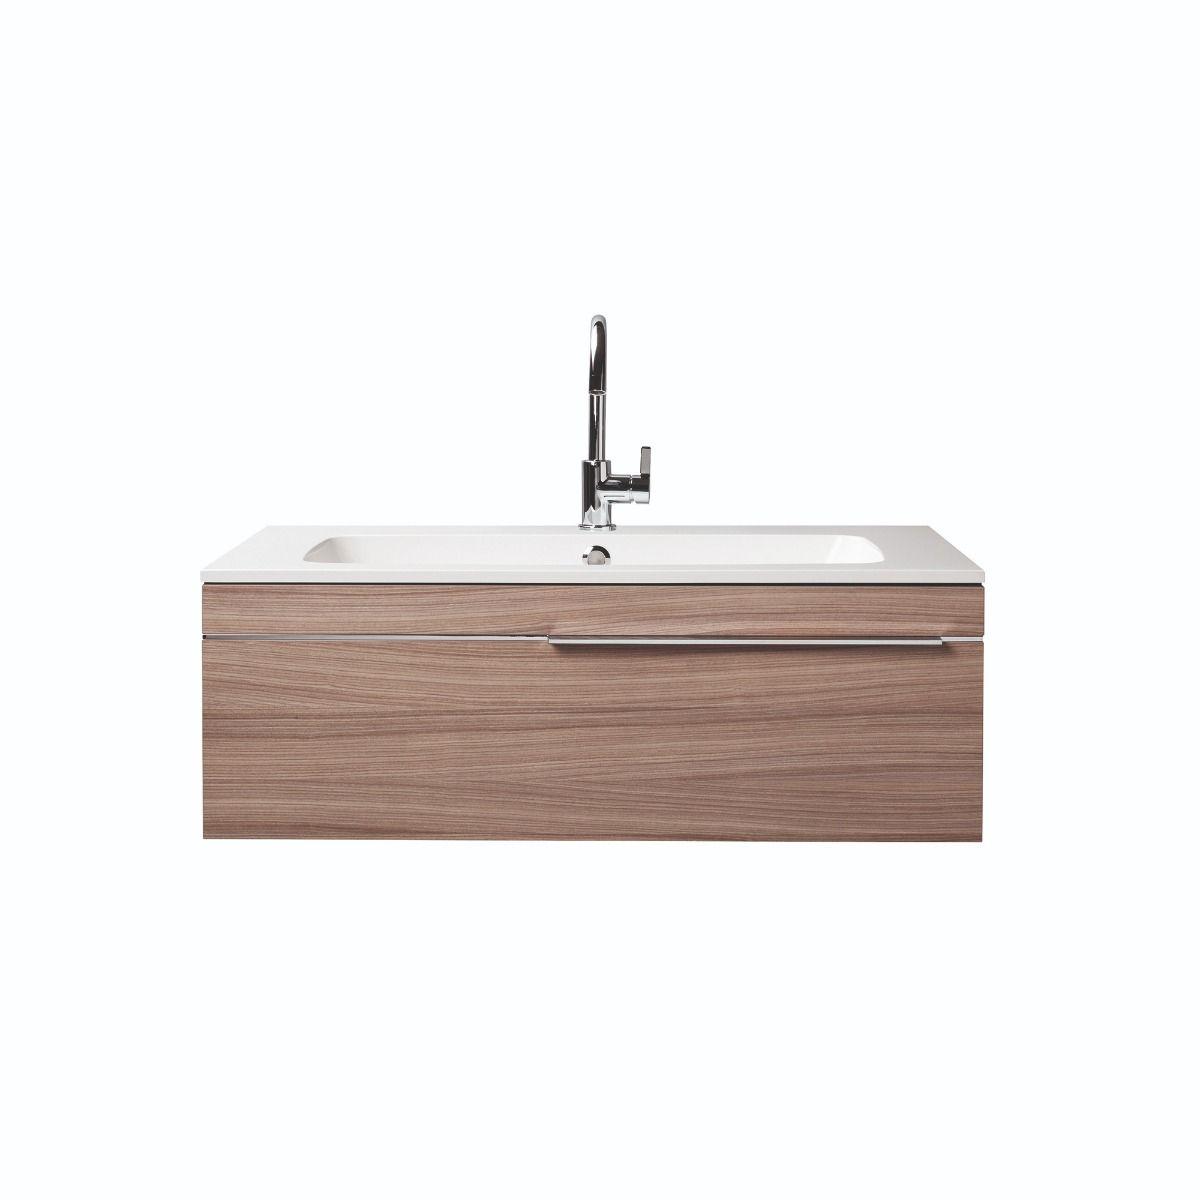 La Dolce Vita Basin and drawer unit 900